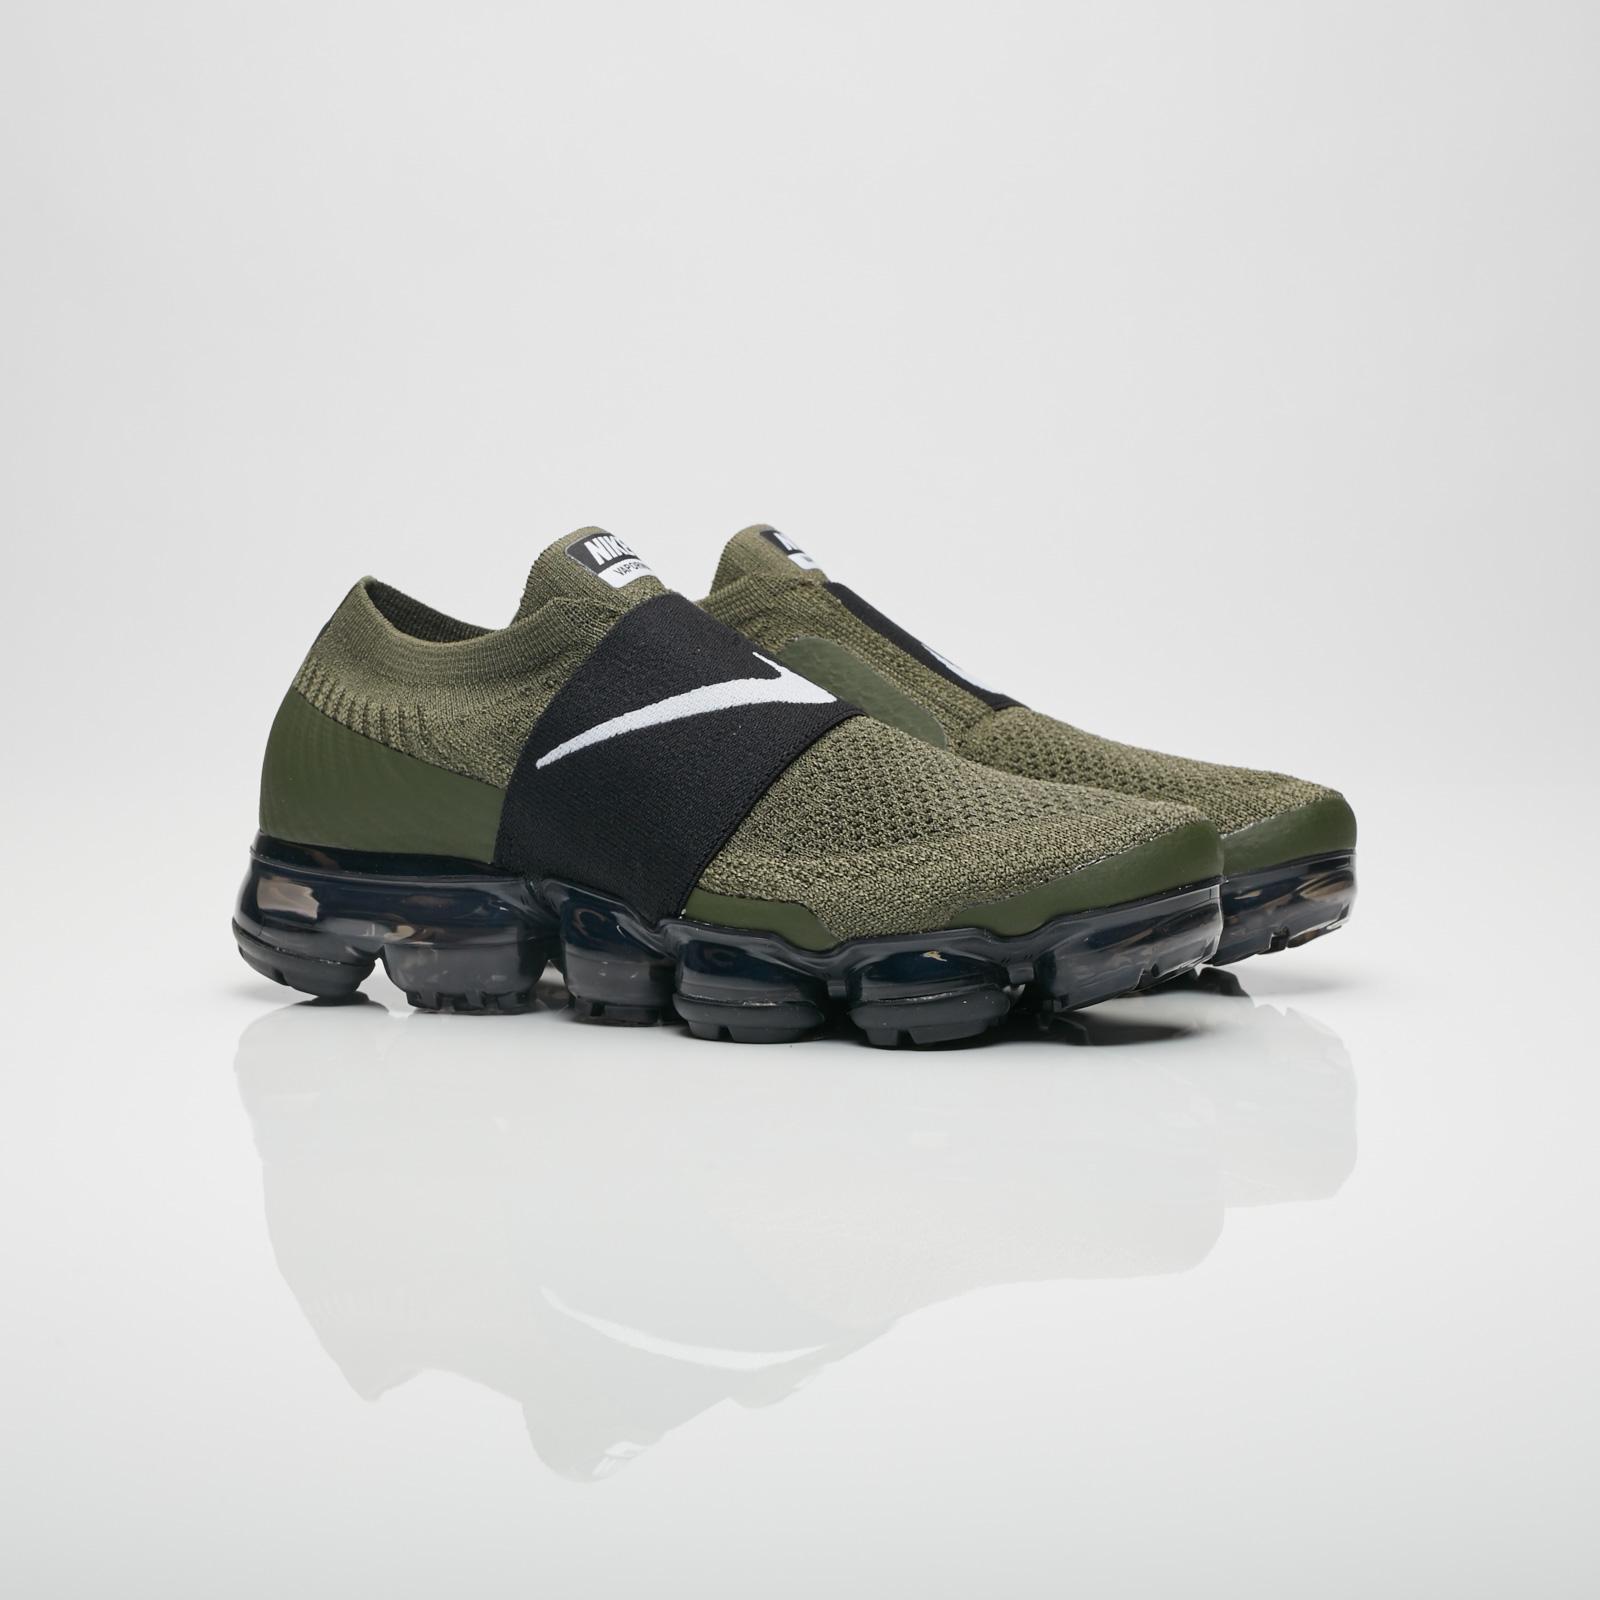 Nike Air Vapormax Flyknit Moc - Aa4155-300 - SNS   sneakers ...